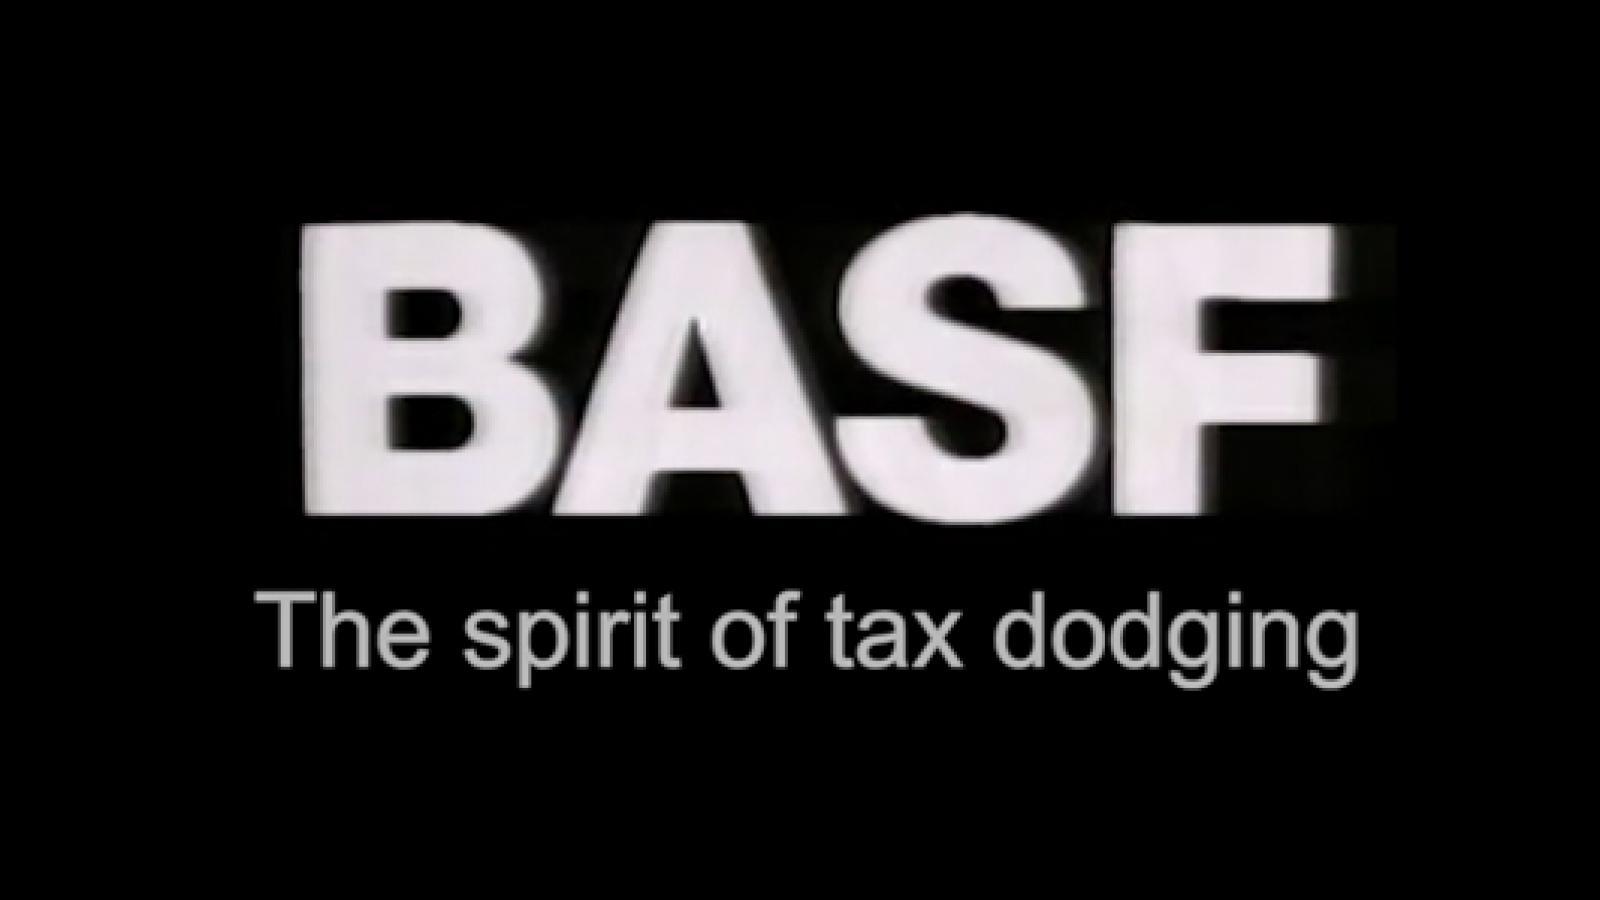 Corporate tax avoidance | Greens/EFA